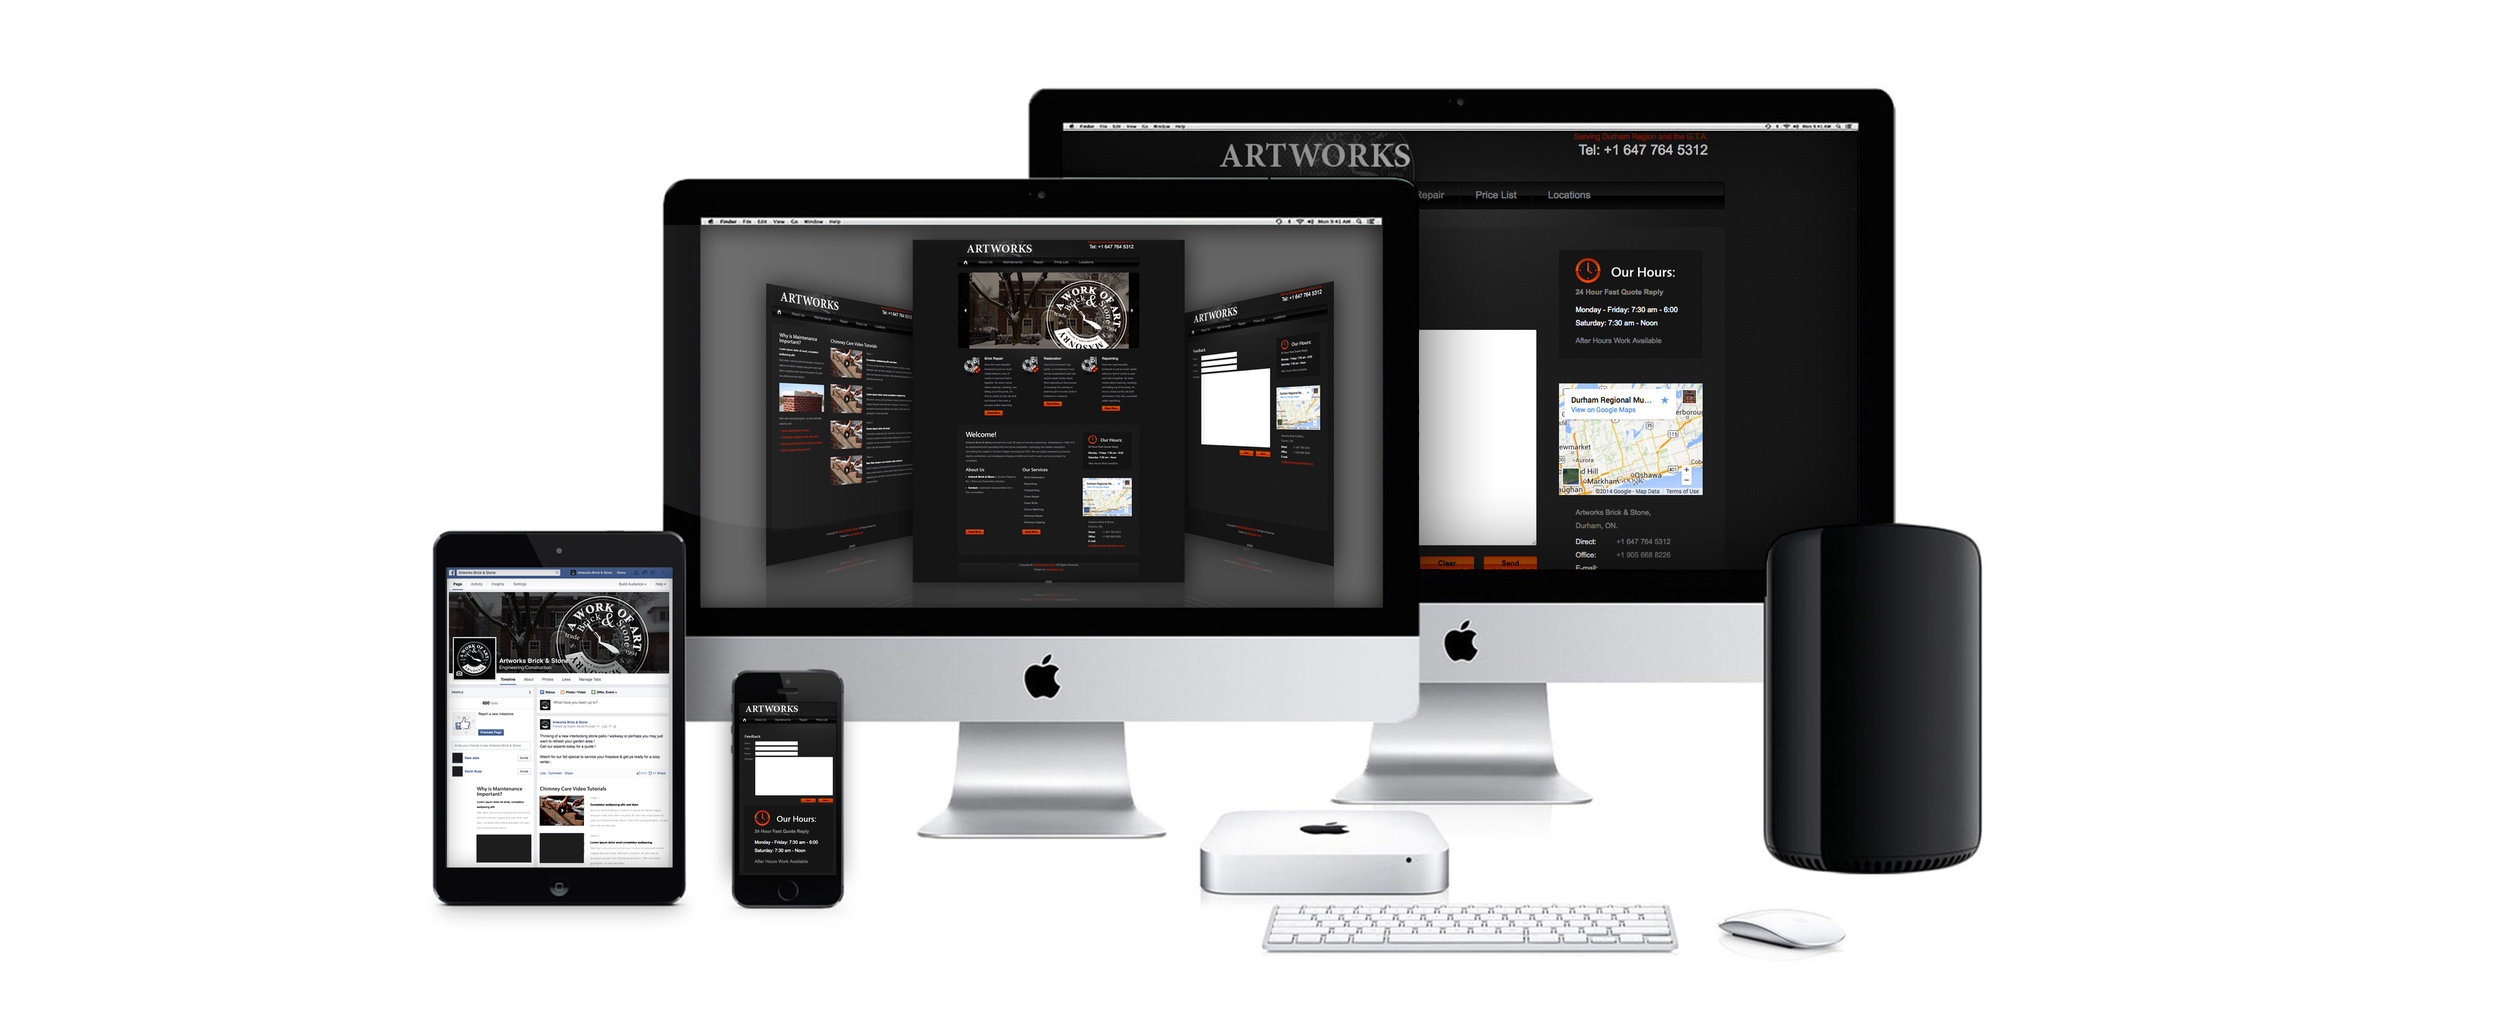 Web Services (computers) Artworks Brick Stone.jpg